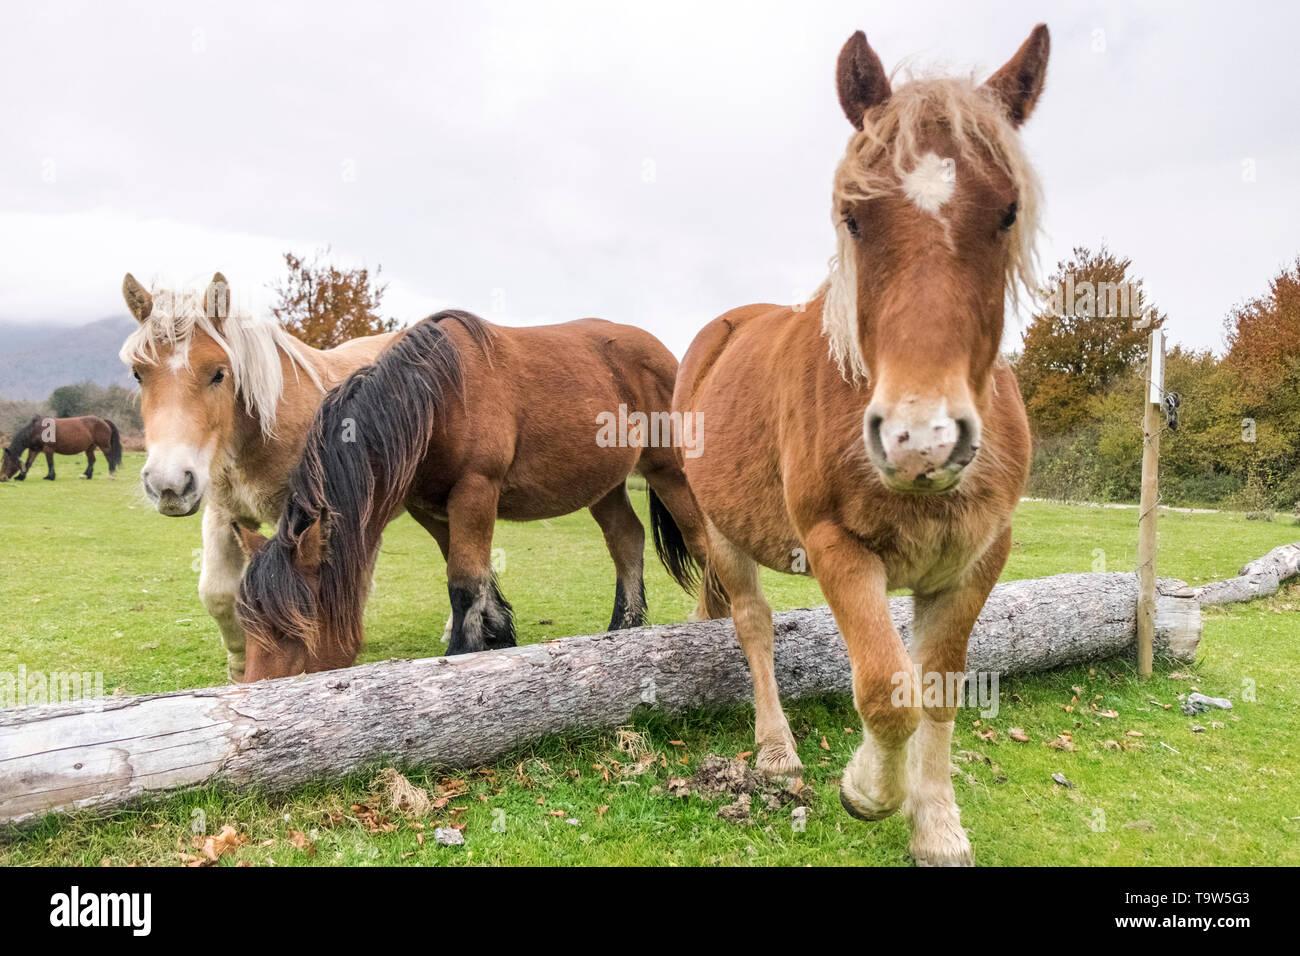 Horses, in Roncesvalles Autumn, Navarre, Spain - Stock Image